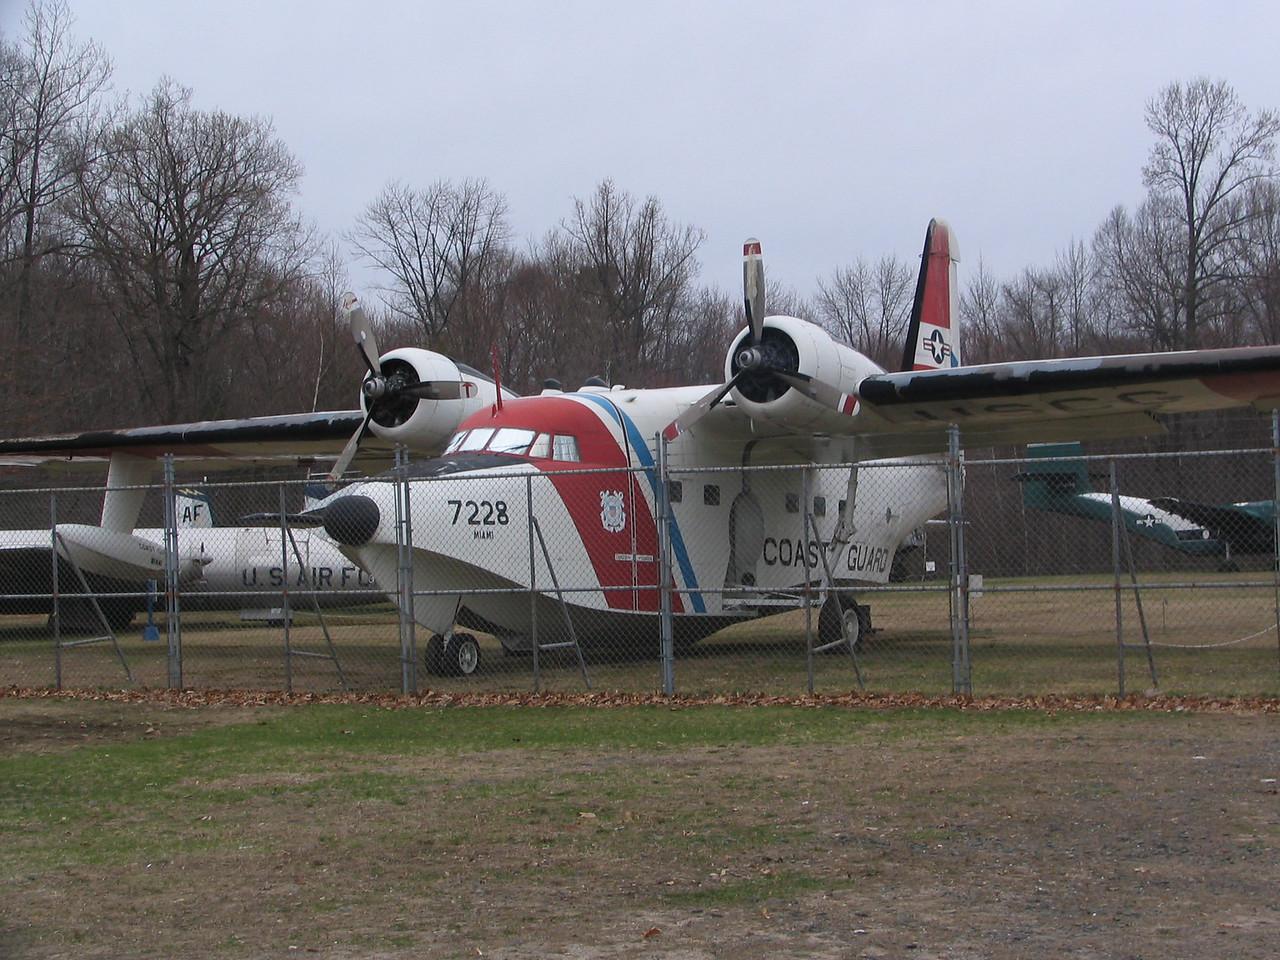 Grumman HU-16E Albatross